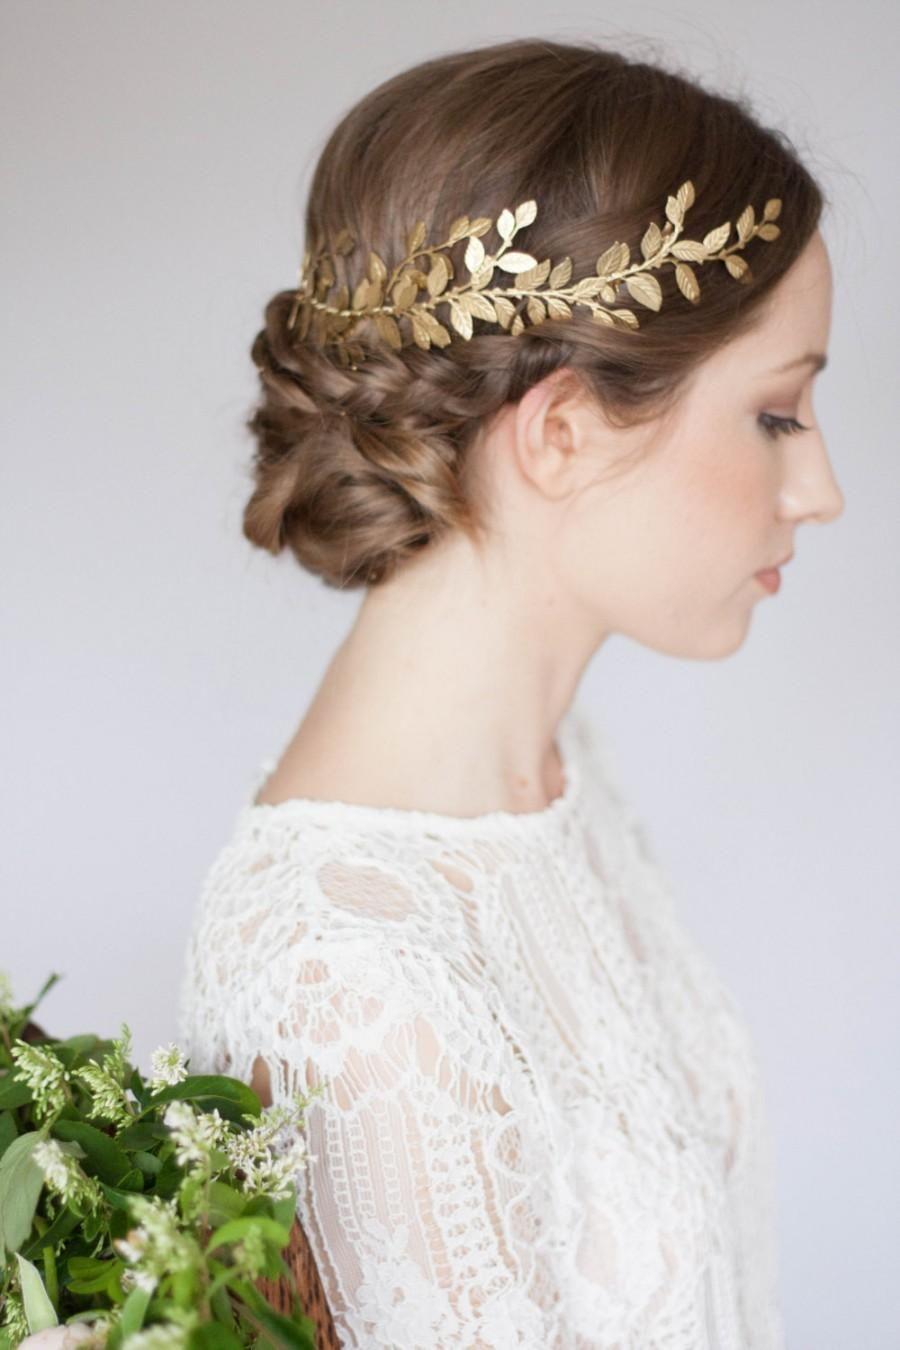 Trendy bridal headpiece - Alena Wrap Headpiece Gold Leaf Circlet Crown Bridal Headpiece Leaf Coronet Bohemian Headpiece Boho Greek Crown Greek Coronet 240